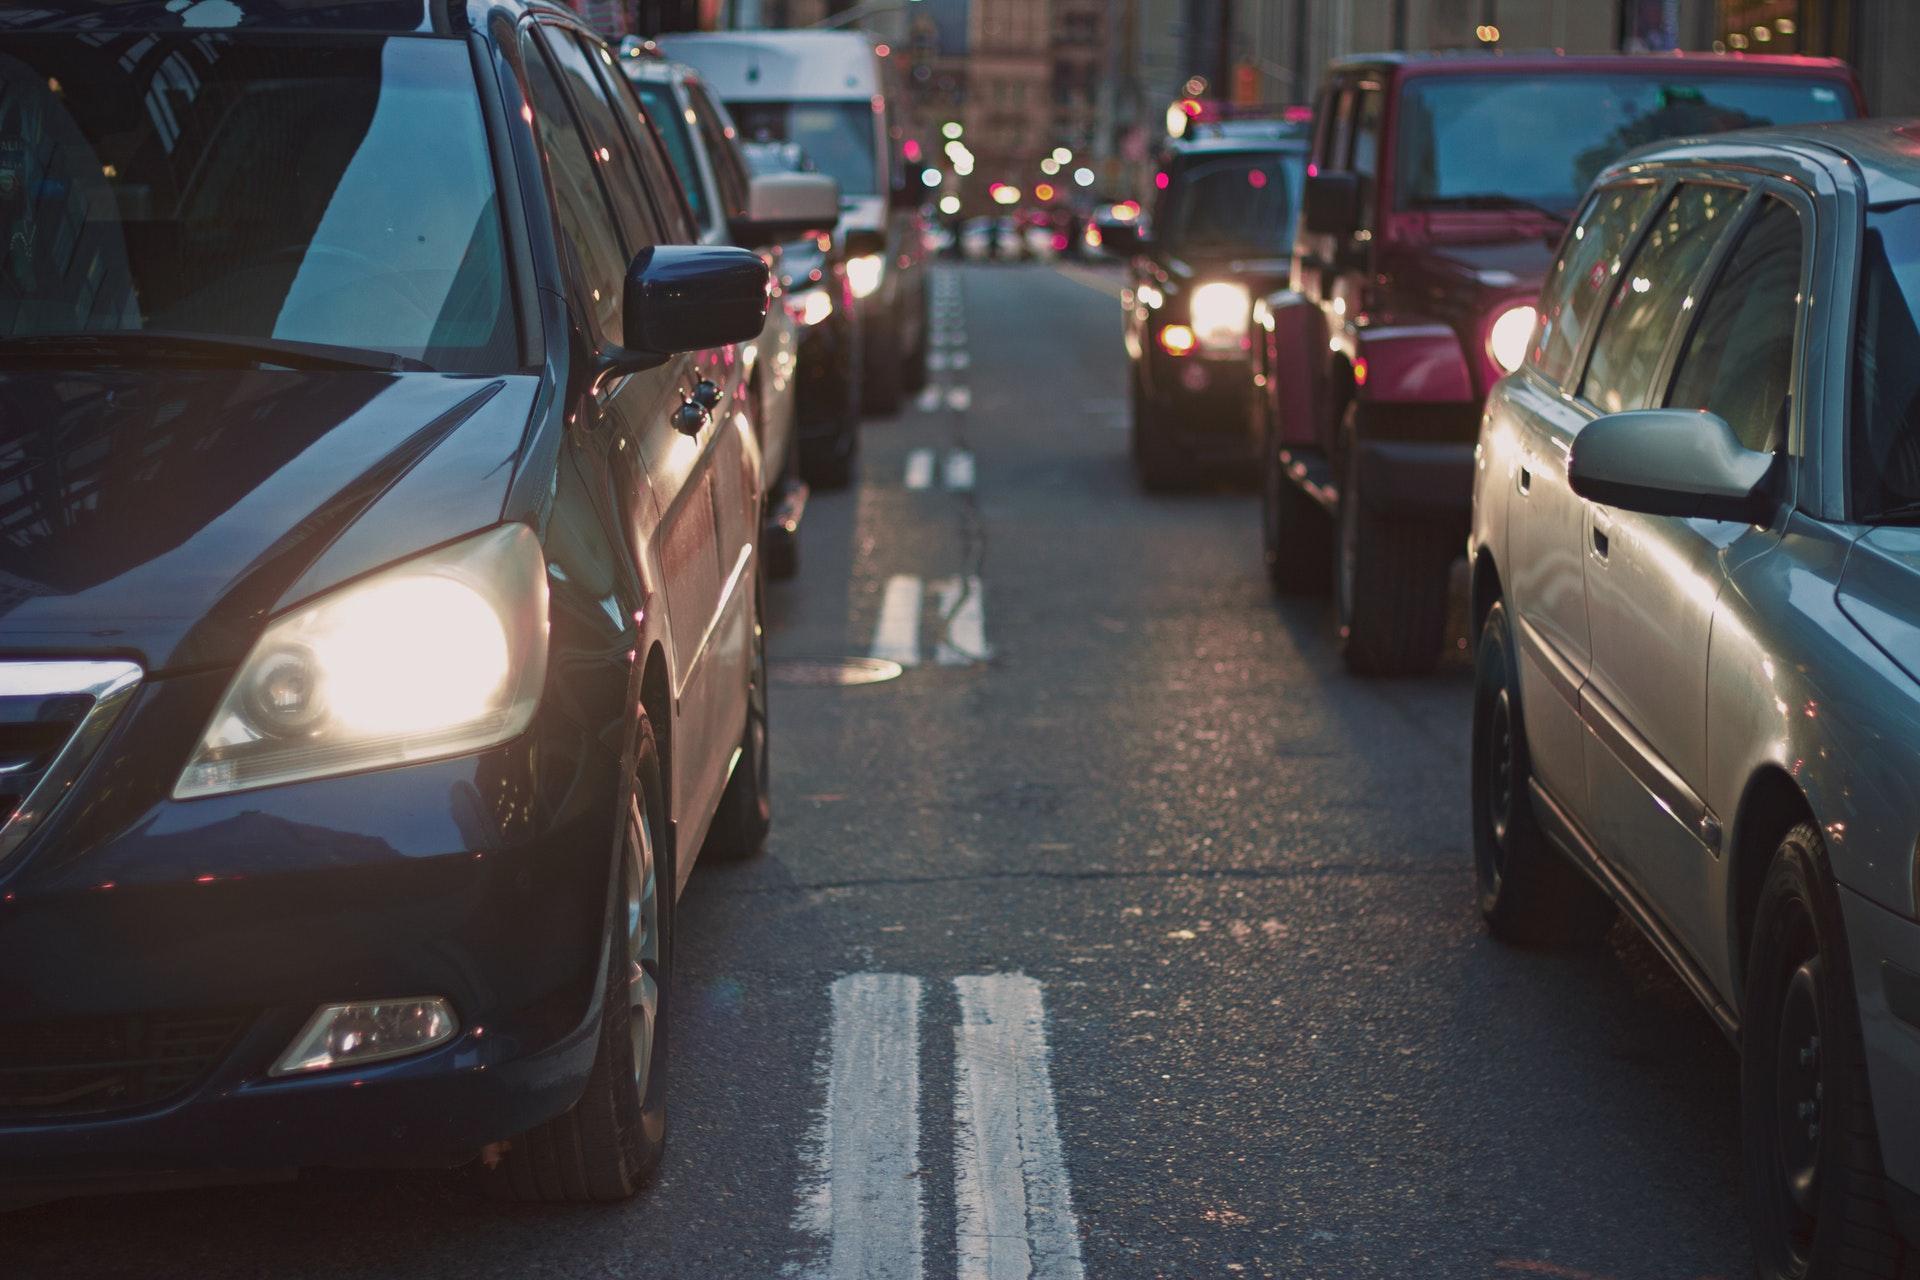 uploads///cars congestion street